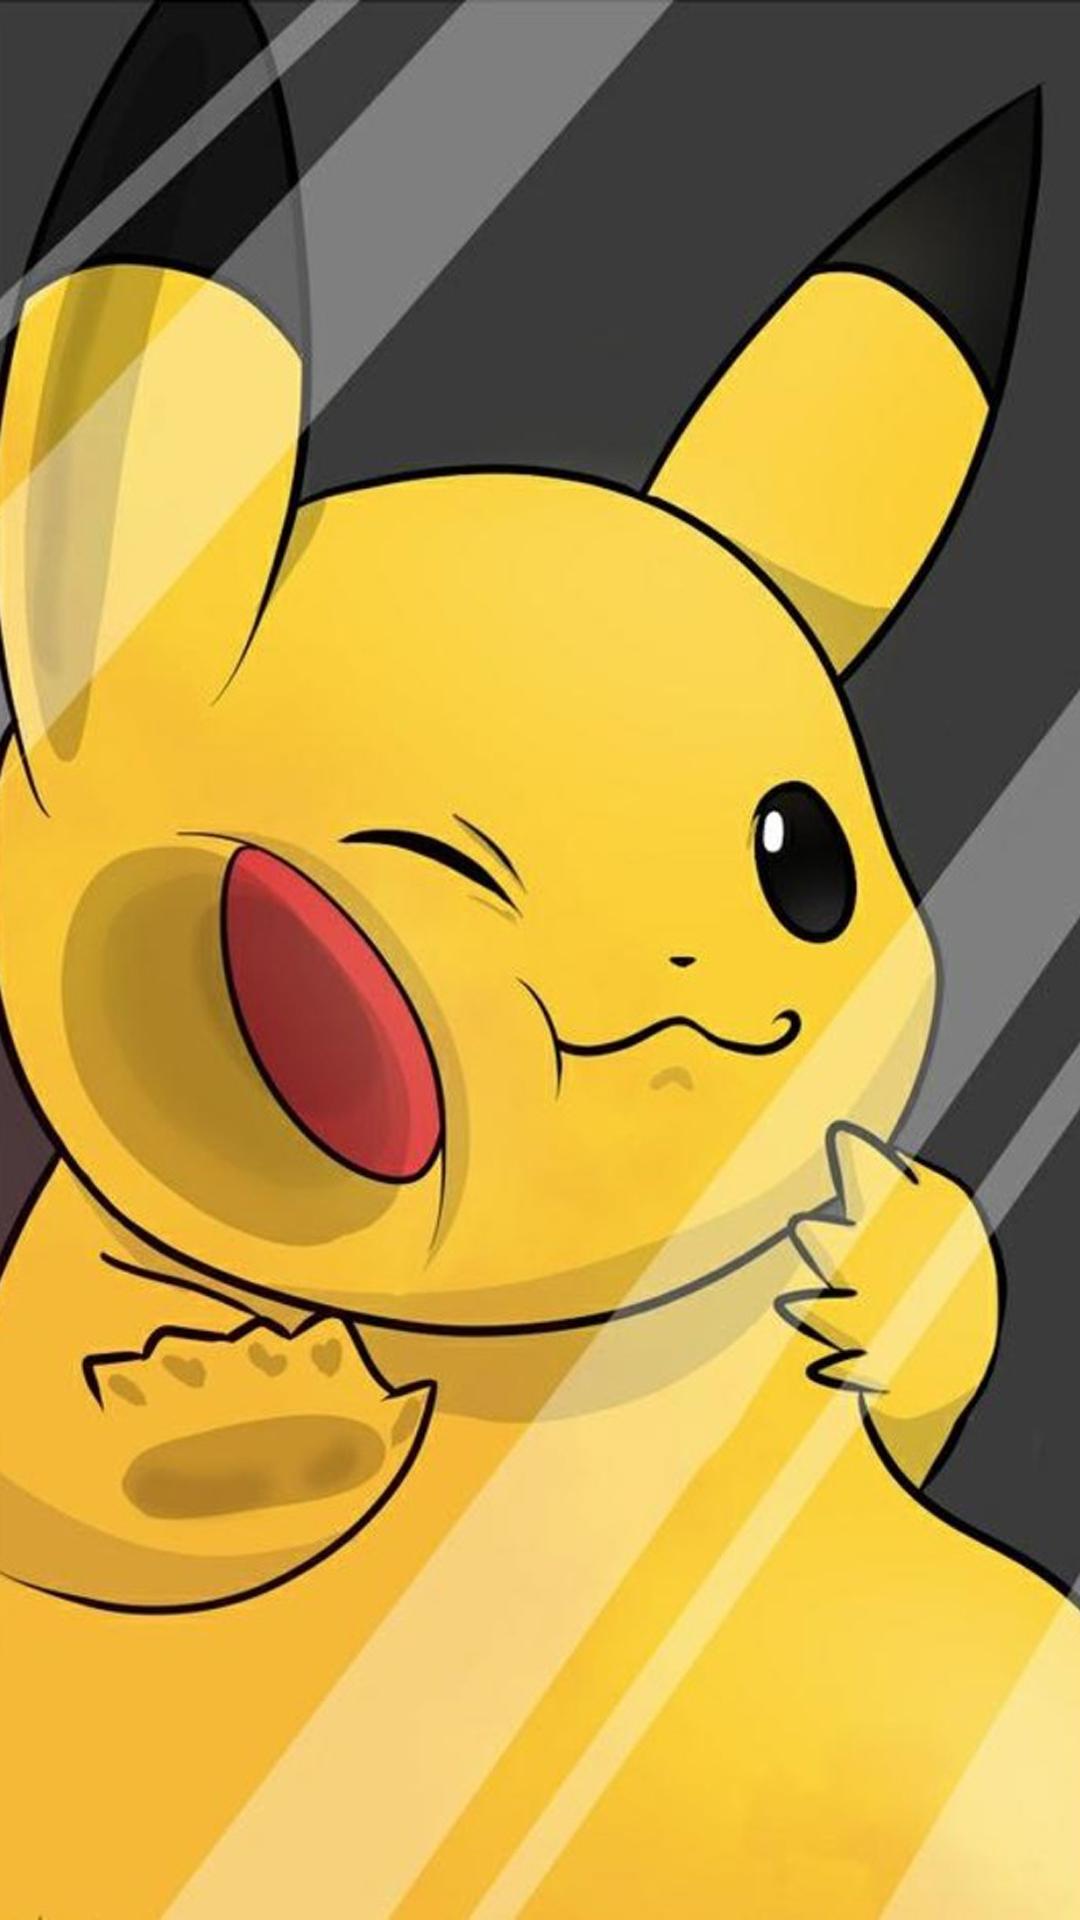 Pusheen Fall Wallpaper Pokemon Iphone Backgrounds Pixelstalk Net